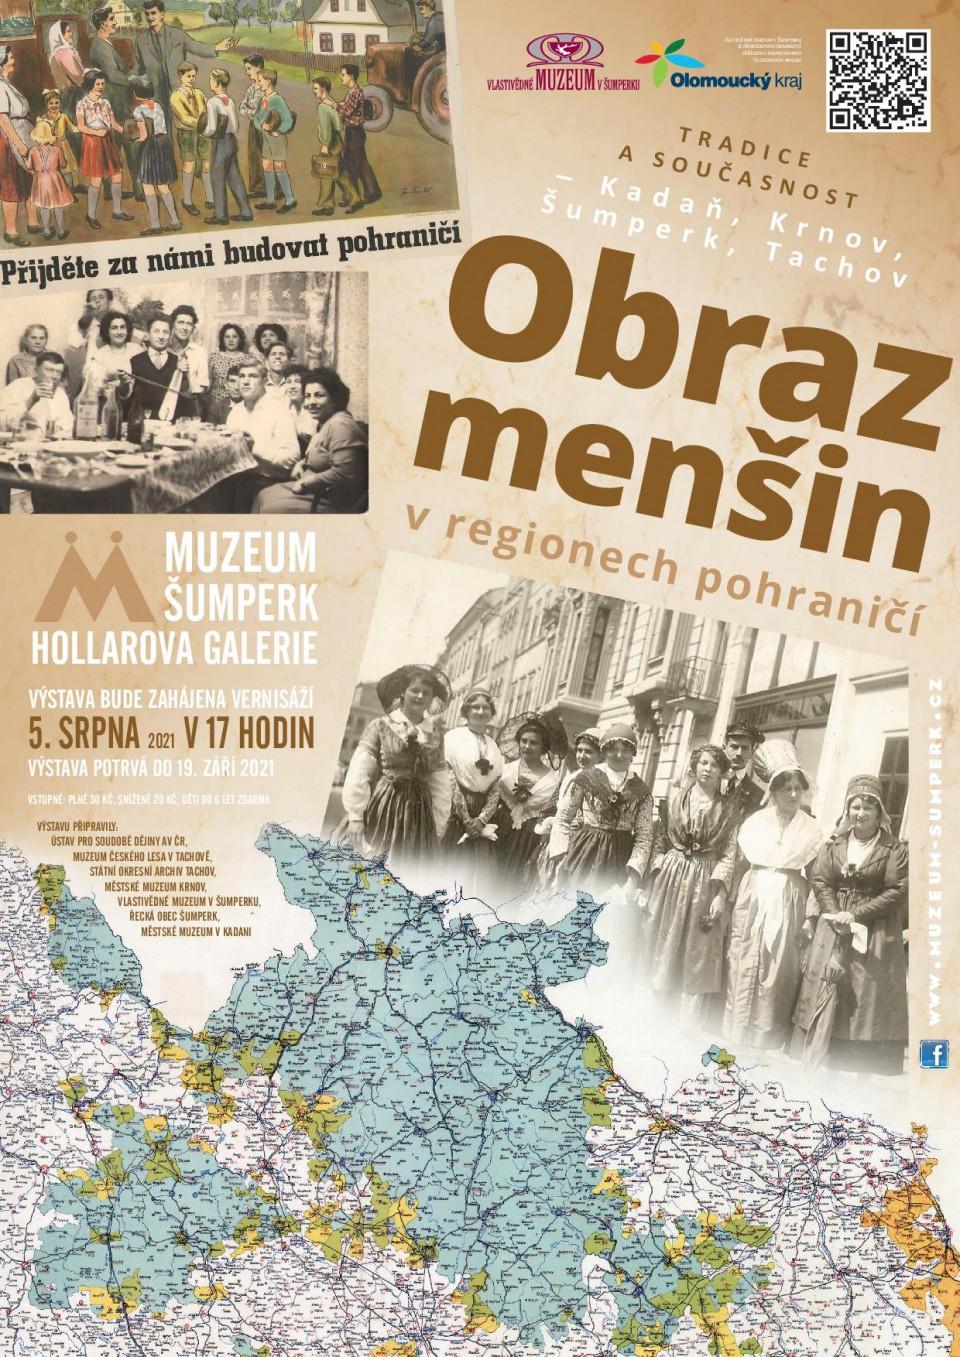 program-muzea-v-sumperku-muzea-zabreh-muzea-mohelnice-pamatniku-adolfa-kaspara-v-losticich-a-lovecko-lesnickeho-muzea-v-usove